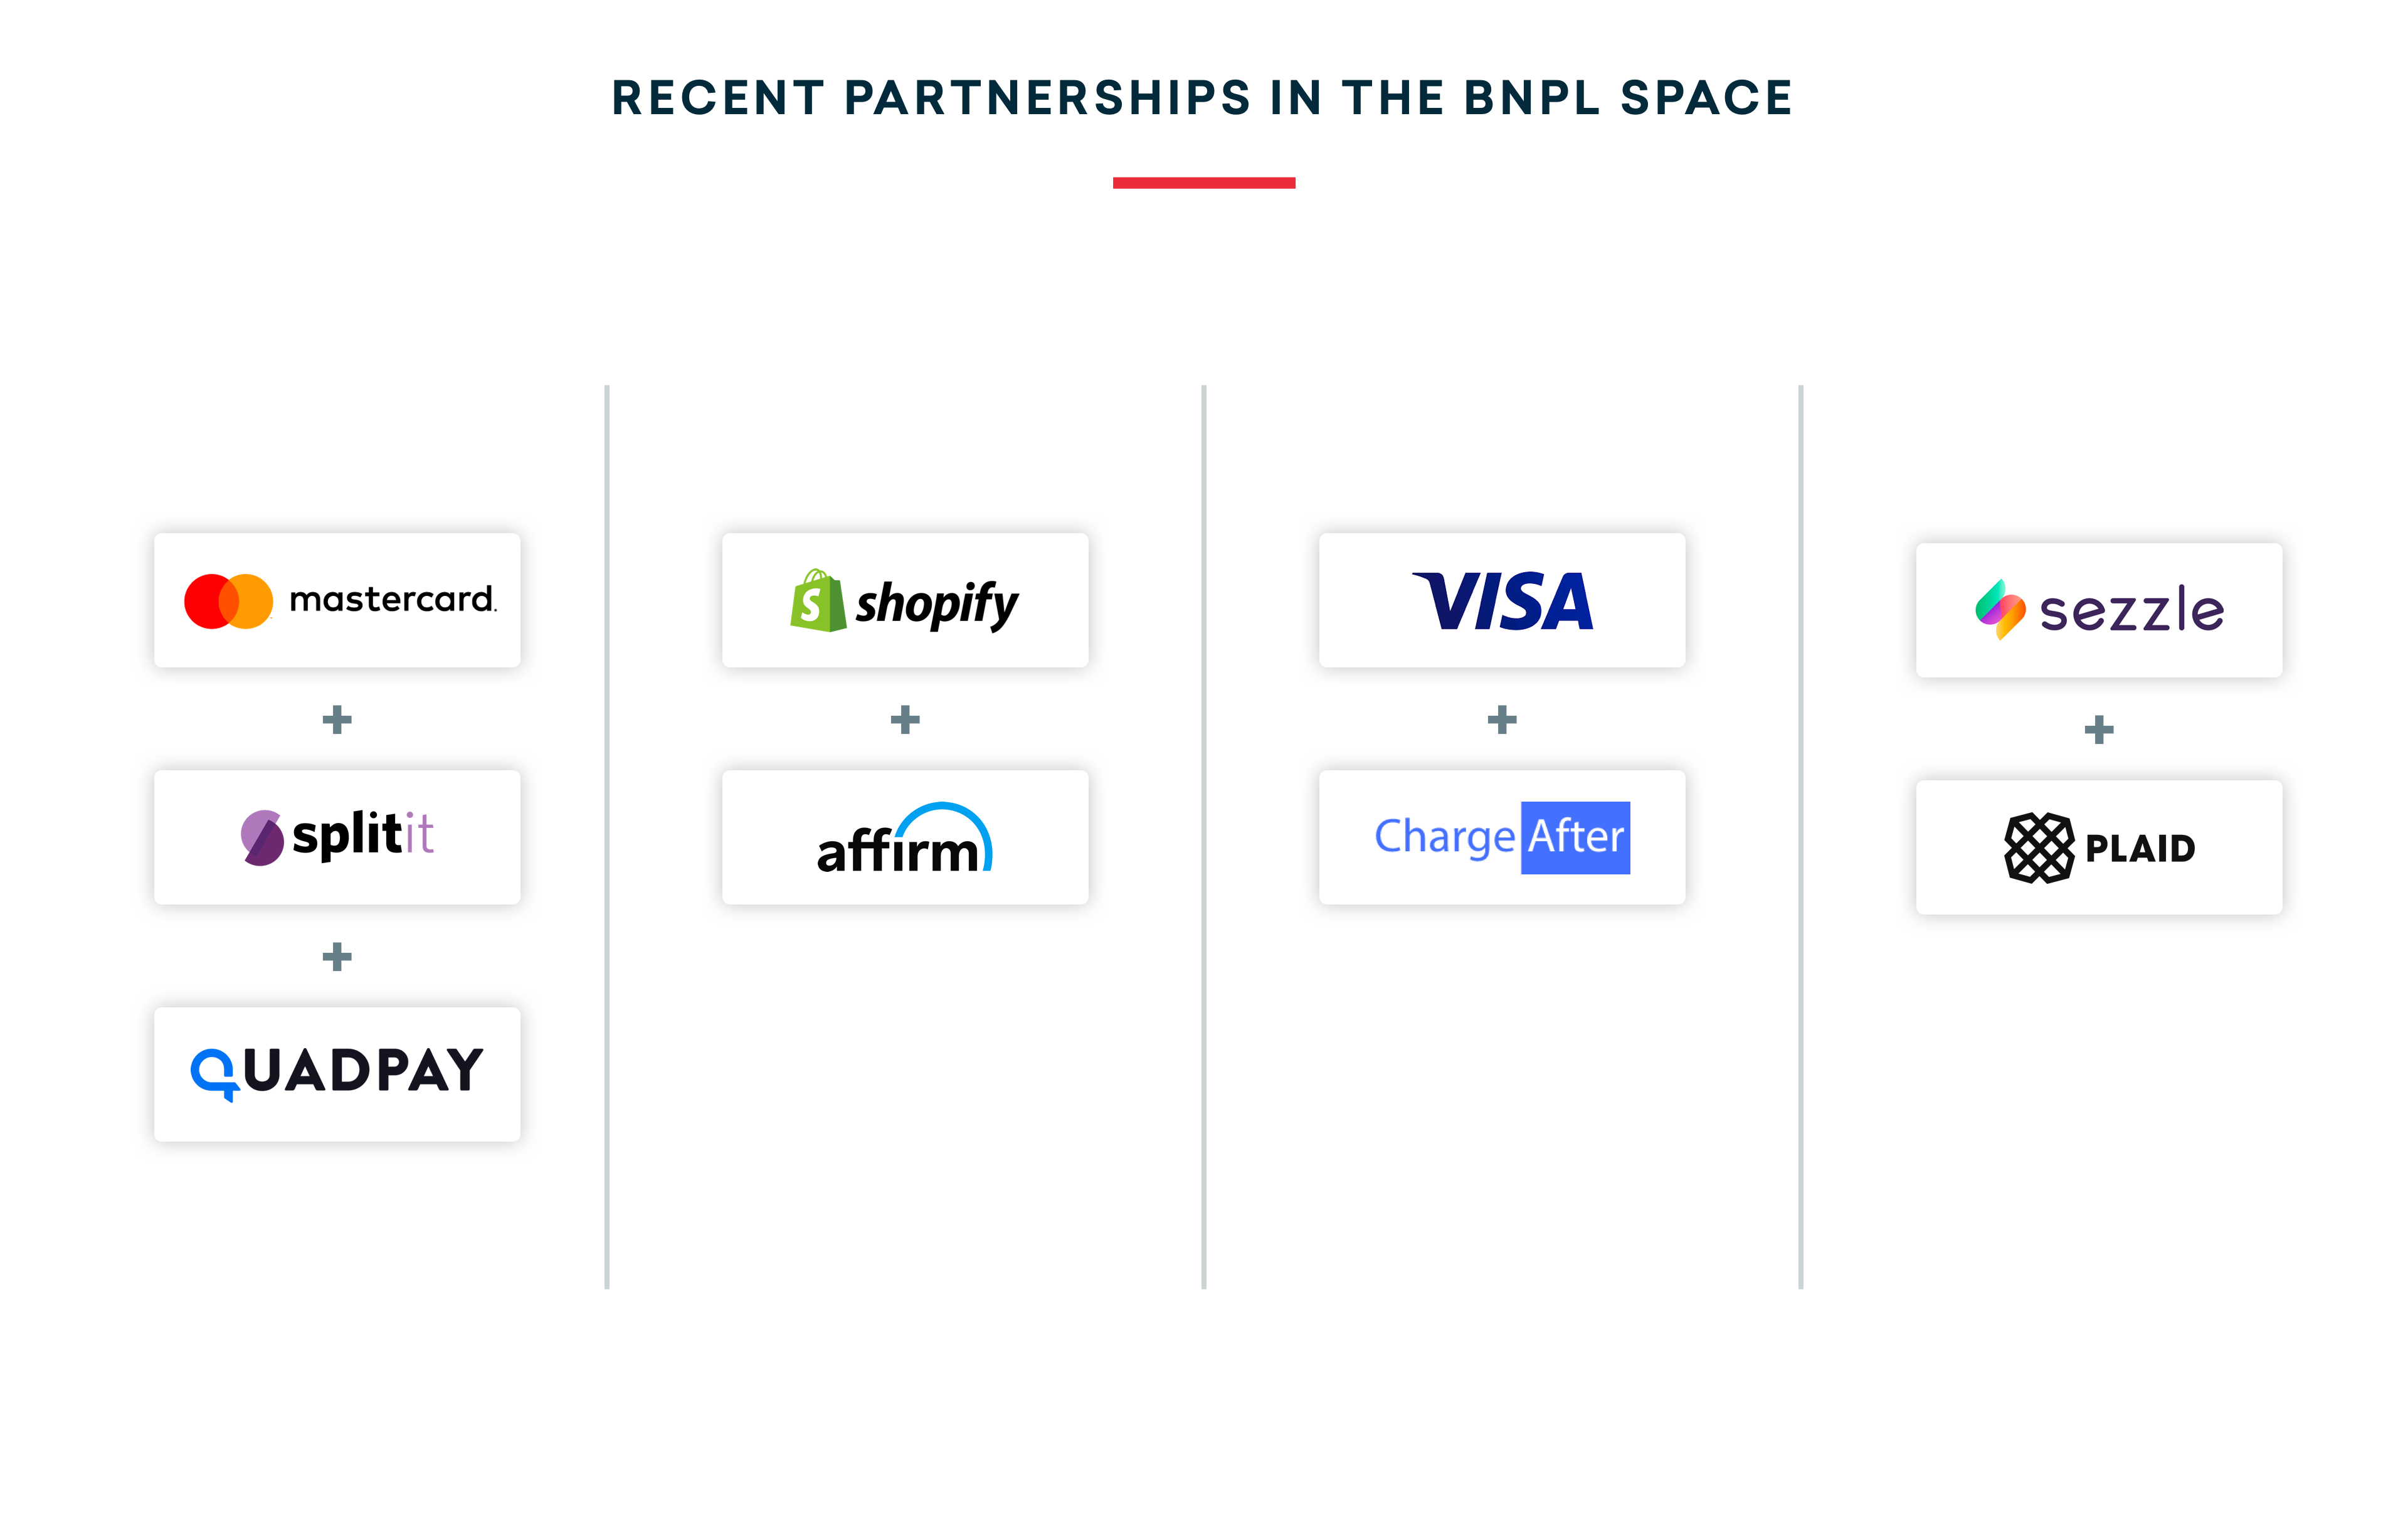 recent-partnerships-in-bnpl